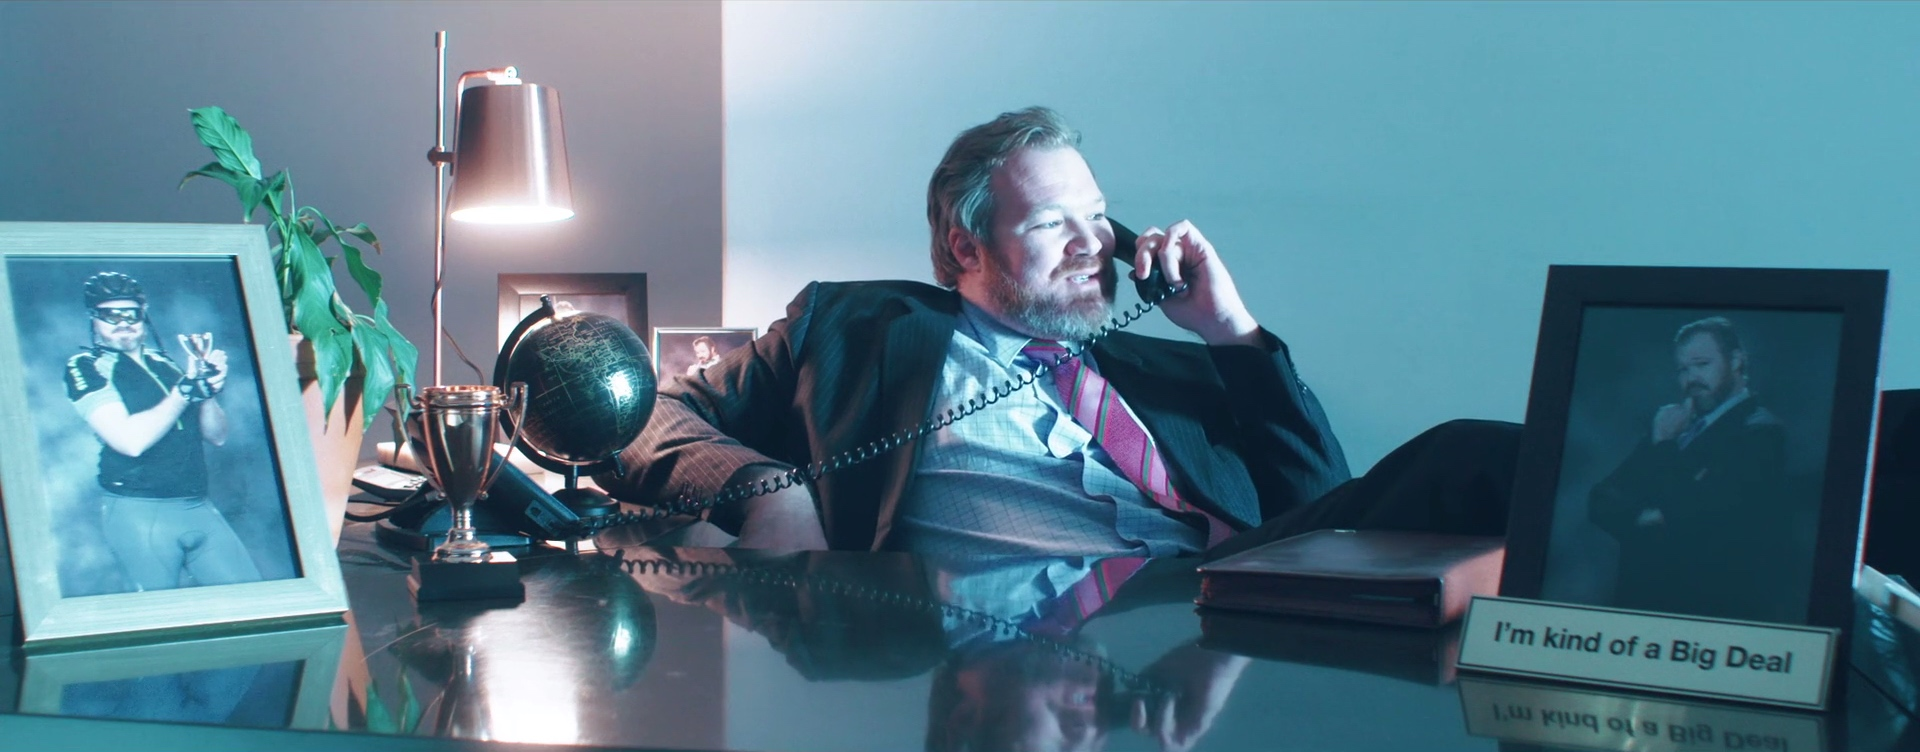 Brad Higgs (Garth Breytenbach), narcissist and douchebag.